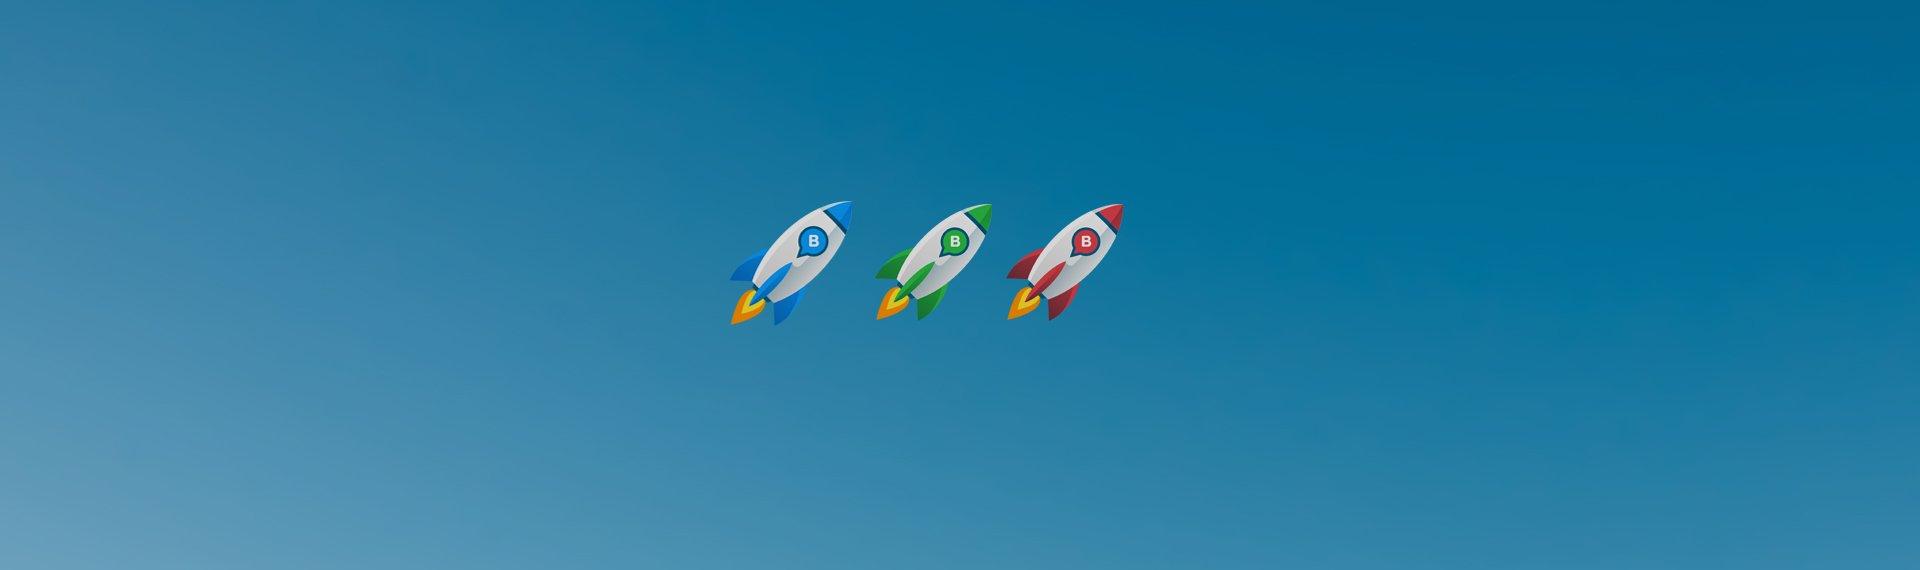 Необычная ракета от Bitok.cc